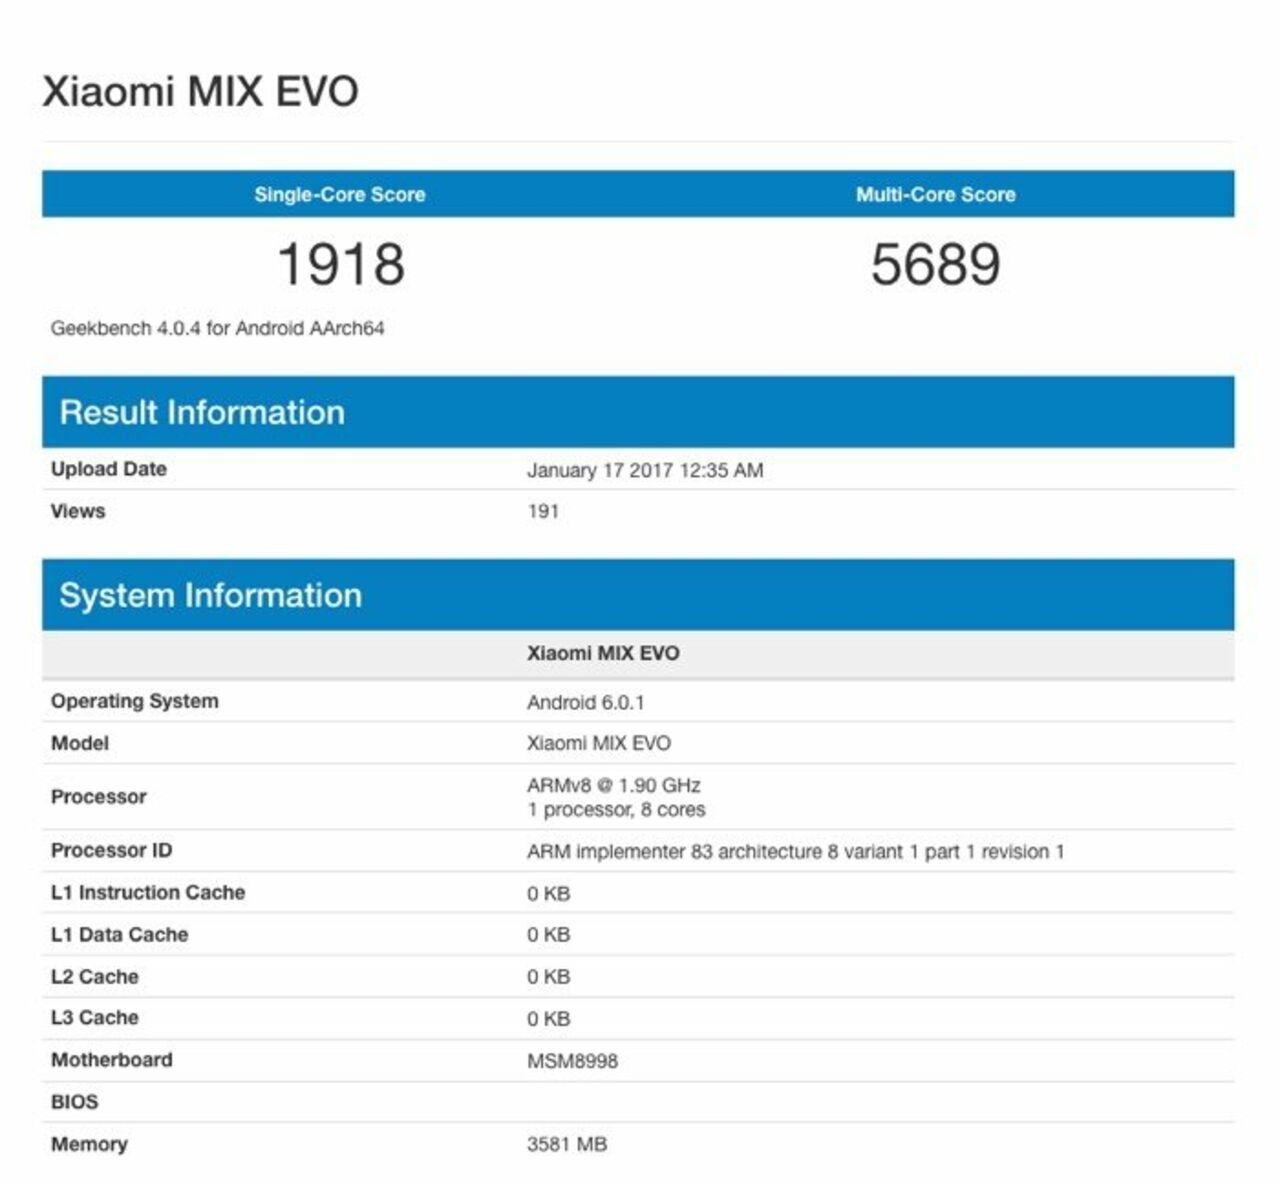 Замечен новый смартфон Xiaomi MIX EVO втесте Geekbench